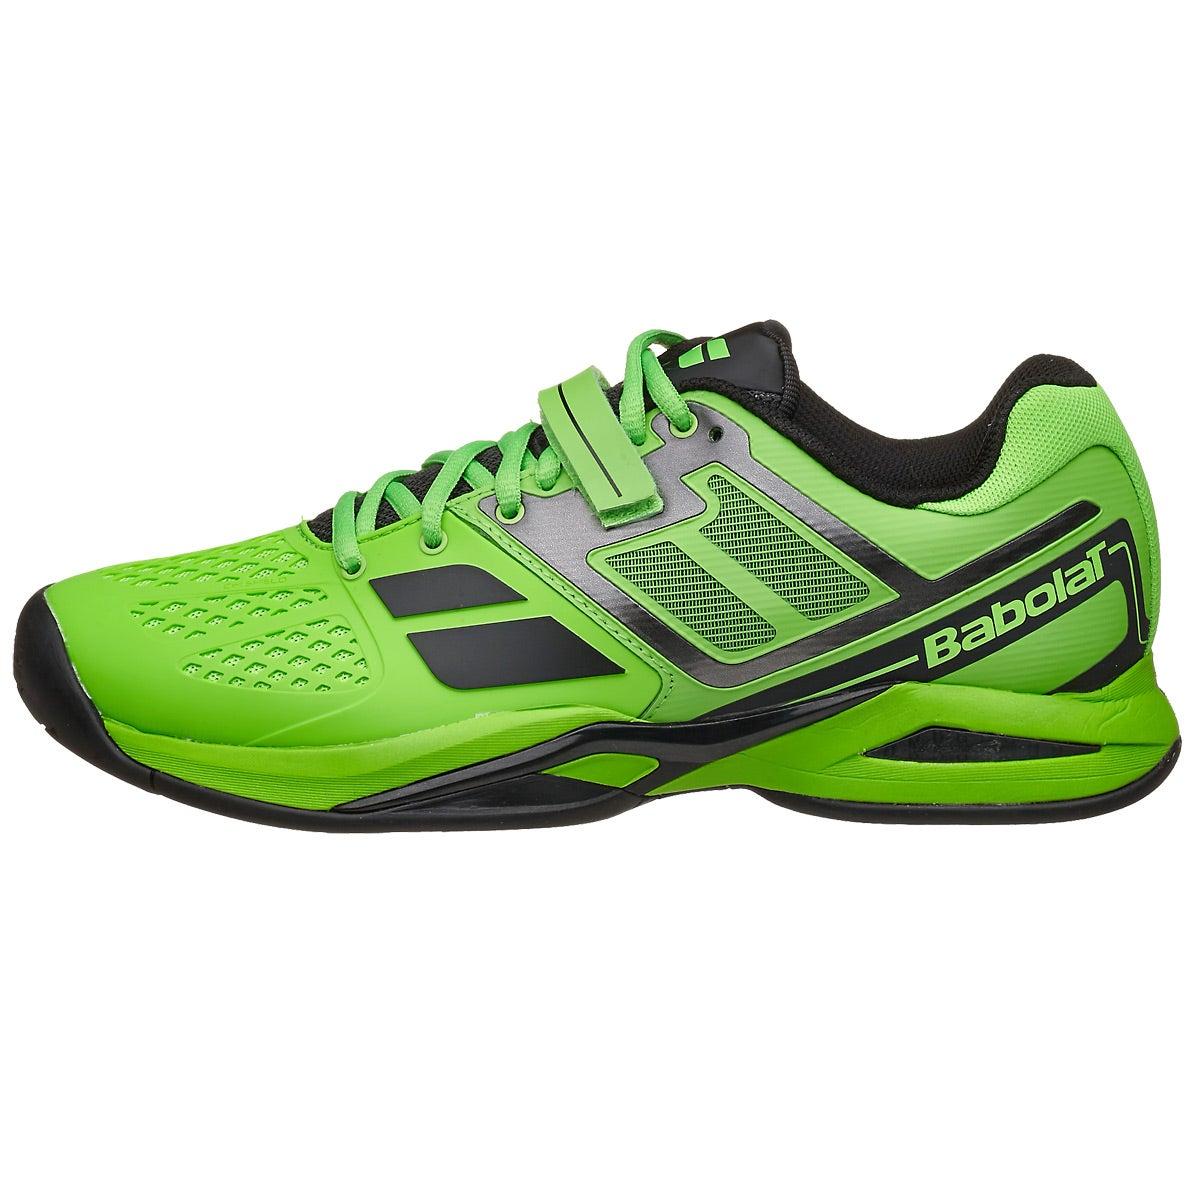 Babolat Tennis Shoes >> Babolat Propulse BPM All Court Lime Green Men's Shoe 360° View